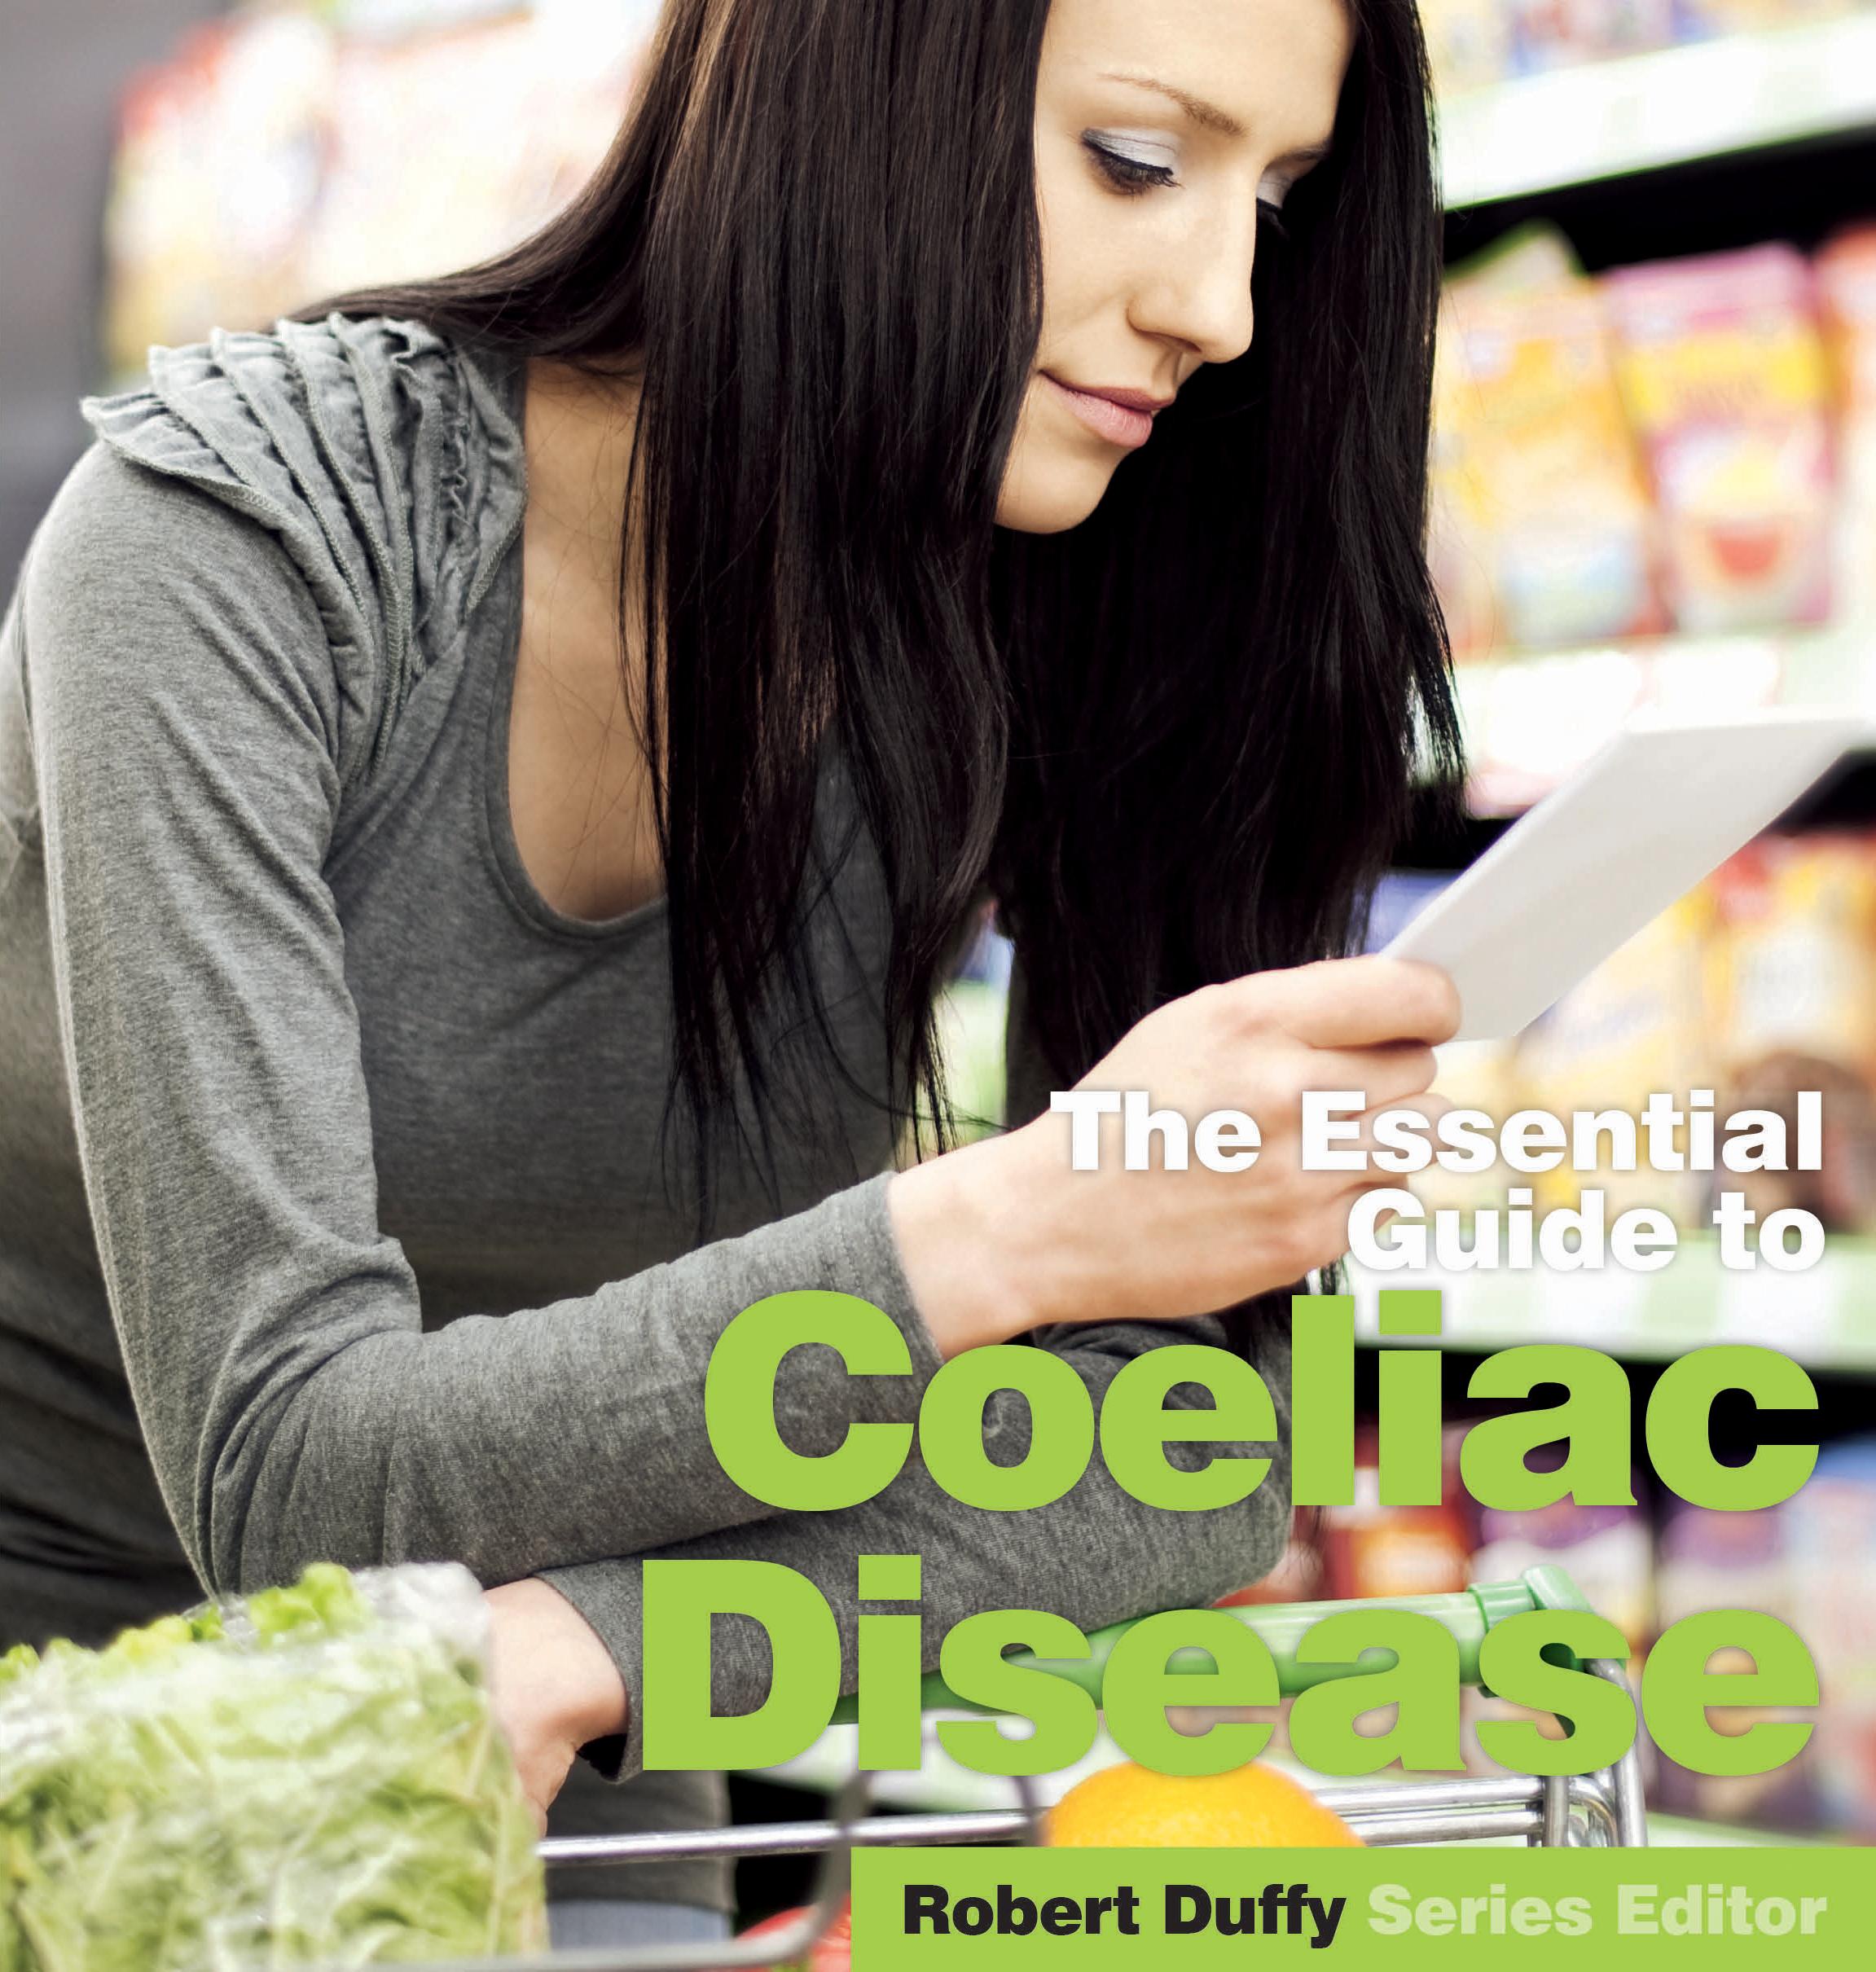 The Essential Guide To Coeliac Disease